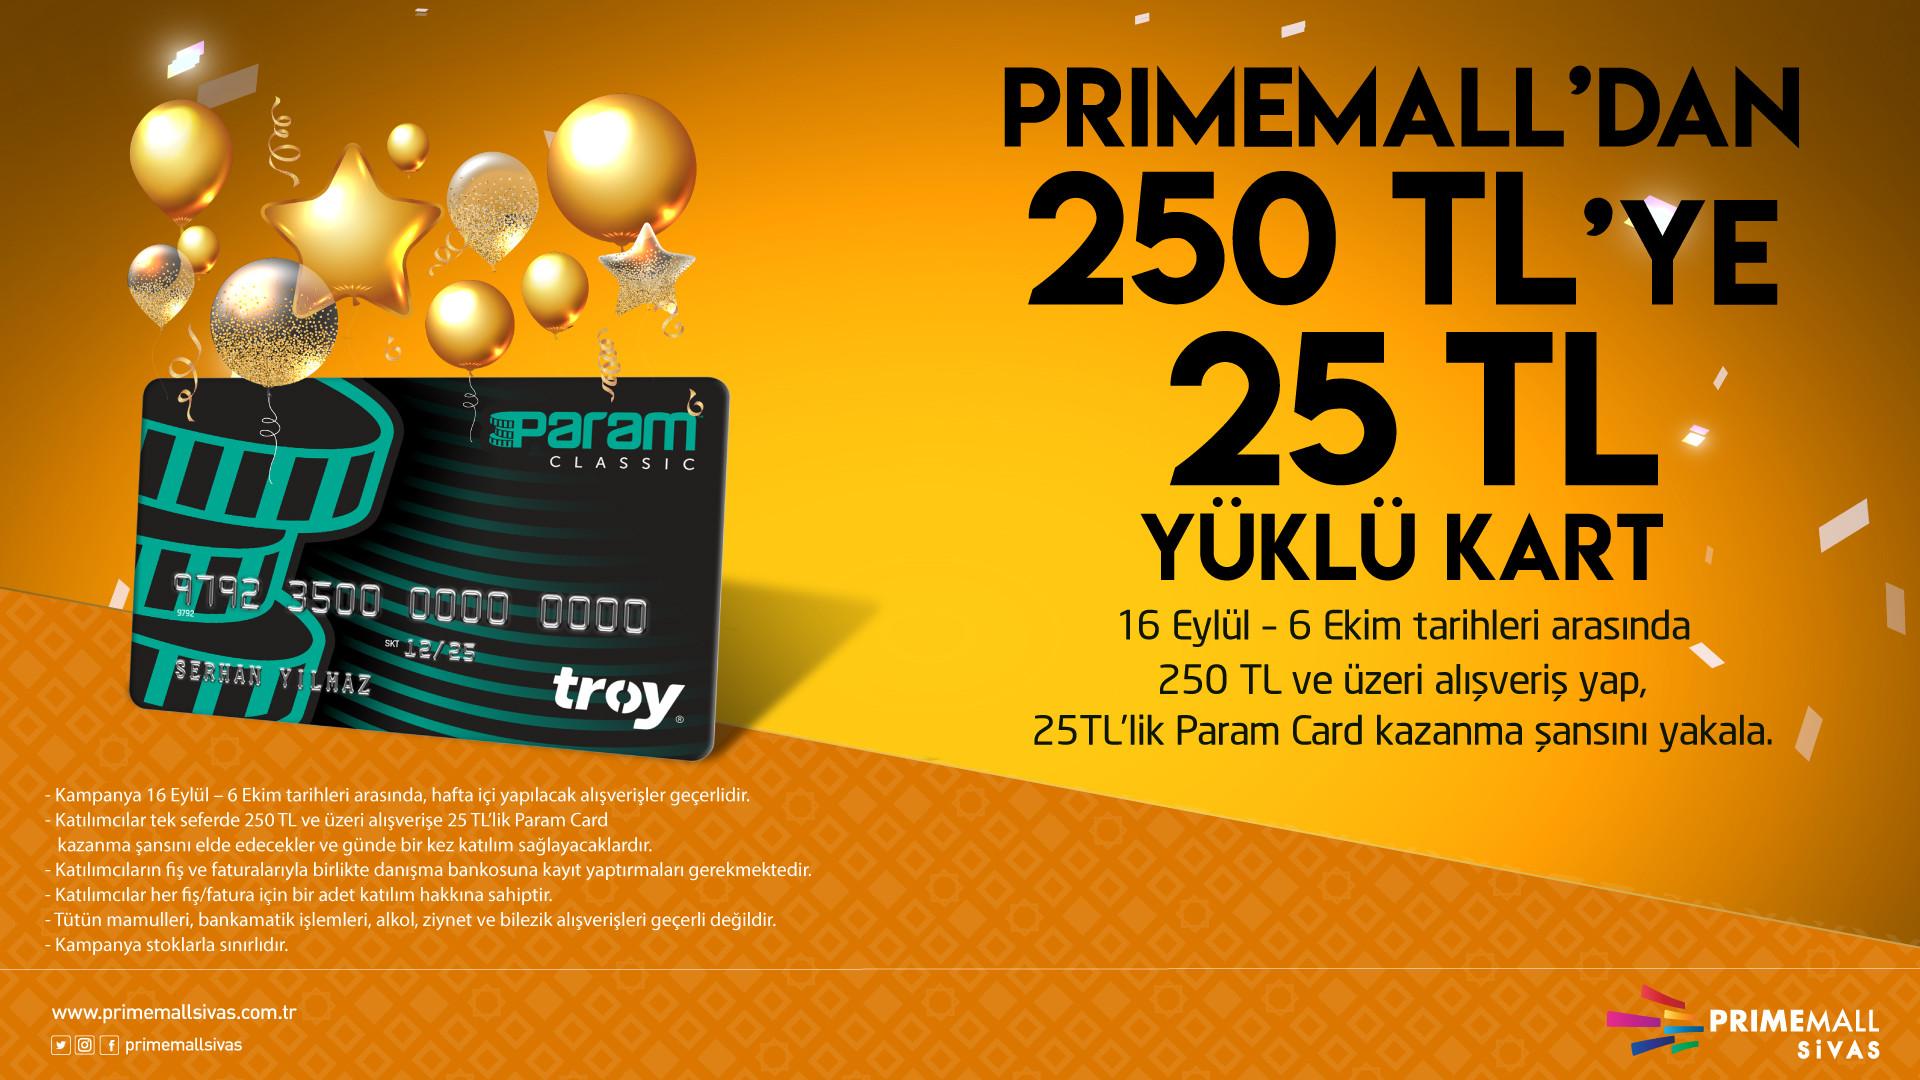 Primemall'dan 250 TL'ye 25 TL Yüklü Kart